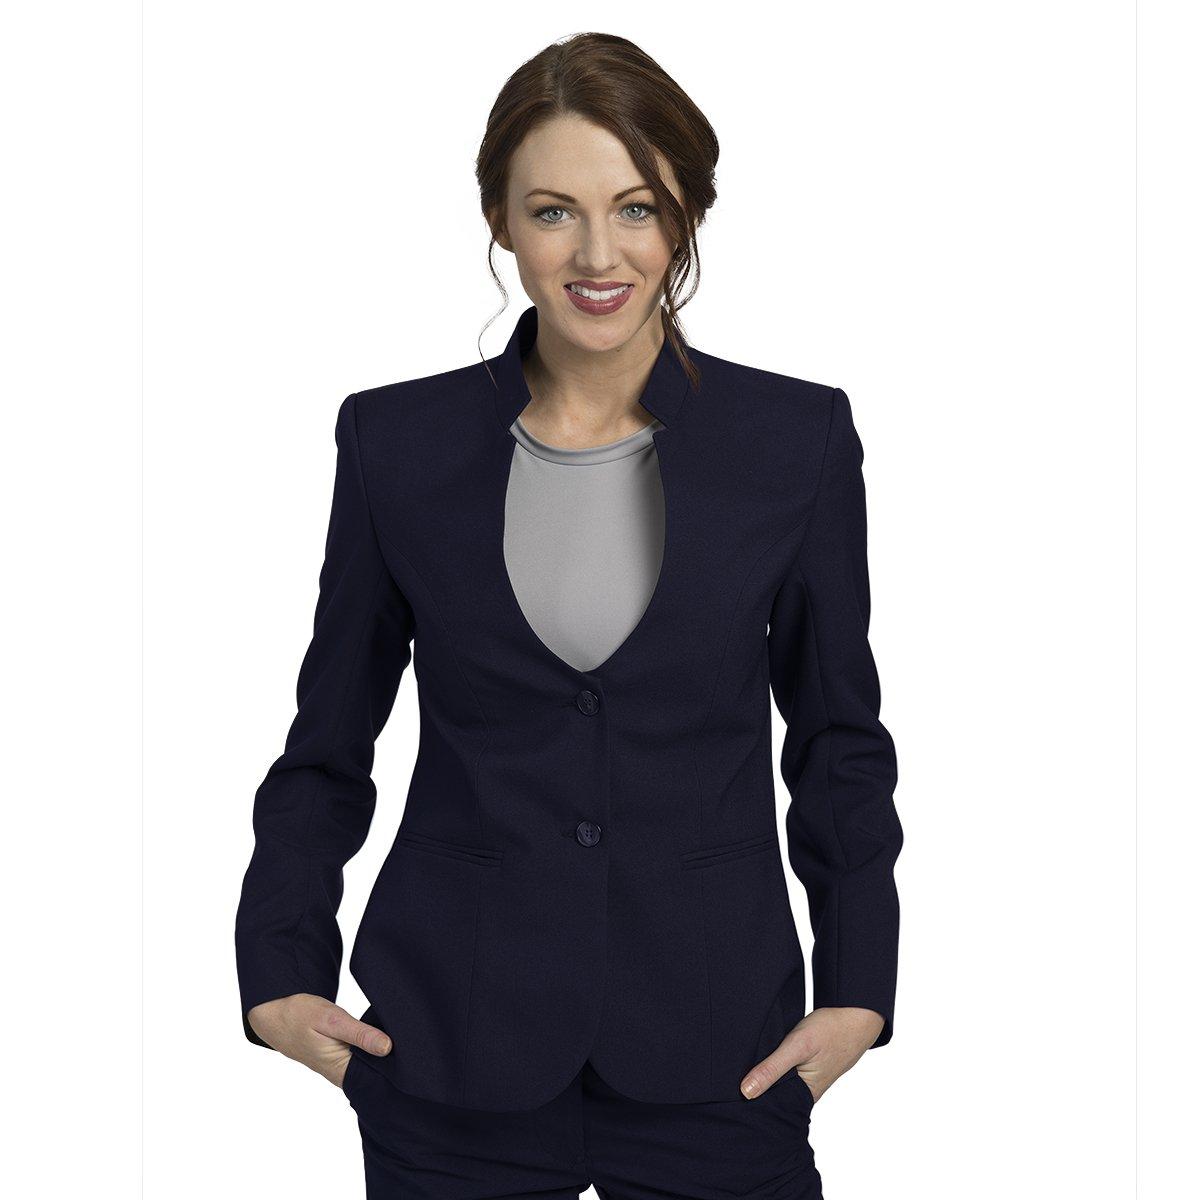 Averill's Sharper Uniforms Women's Ladies Hotel Two Button Stand-Up Collar Blazer Small (6-8) Navy